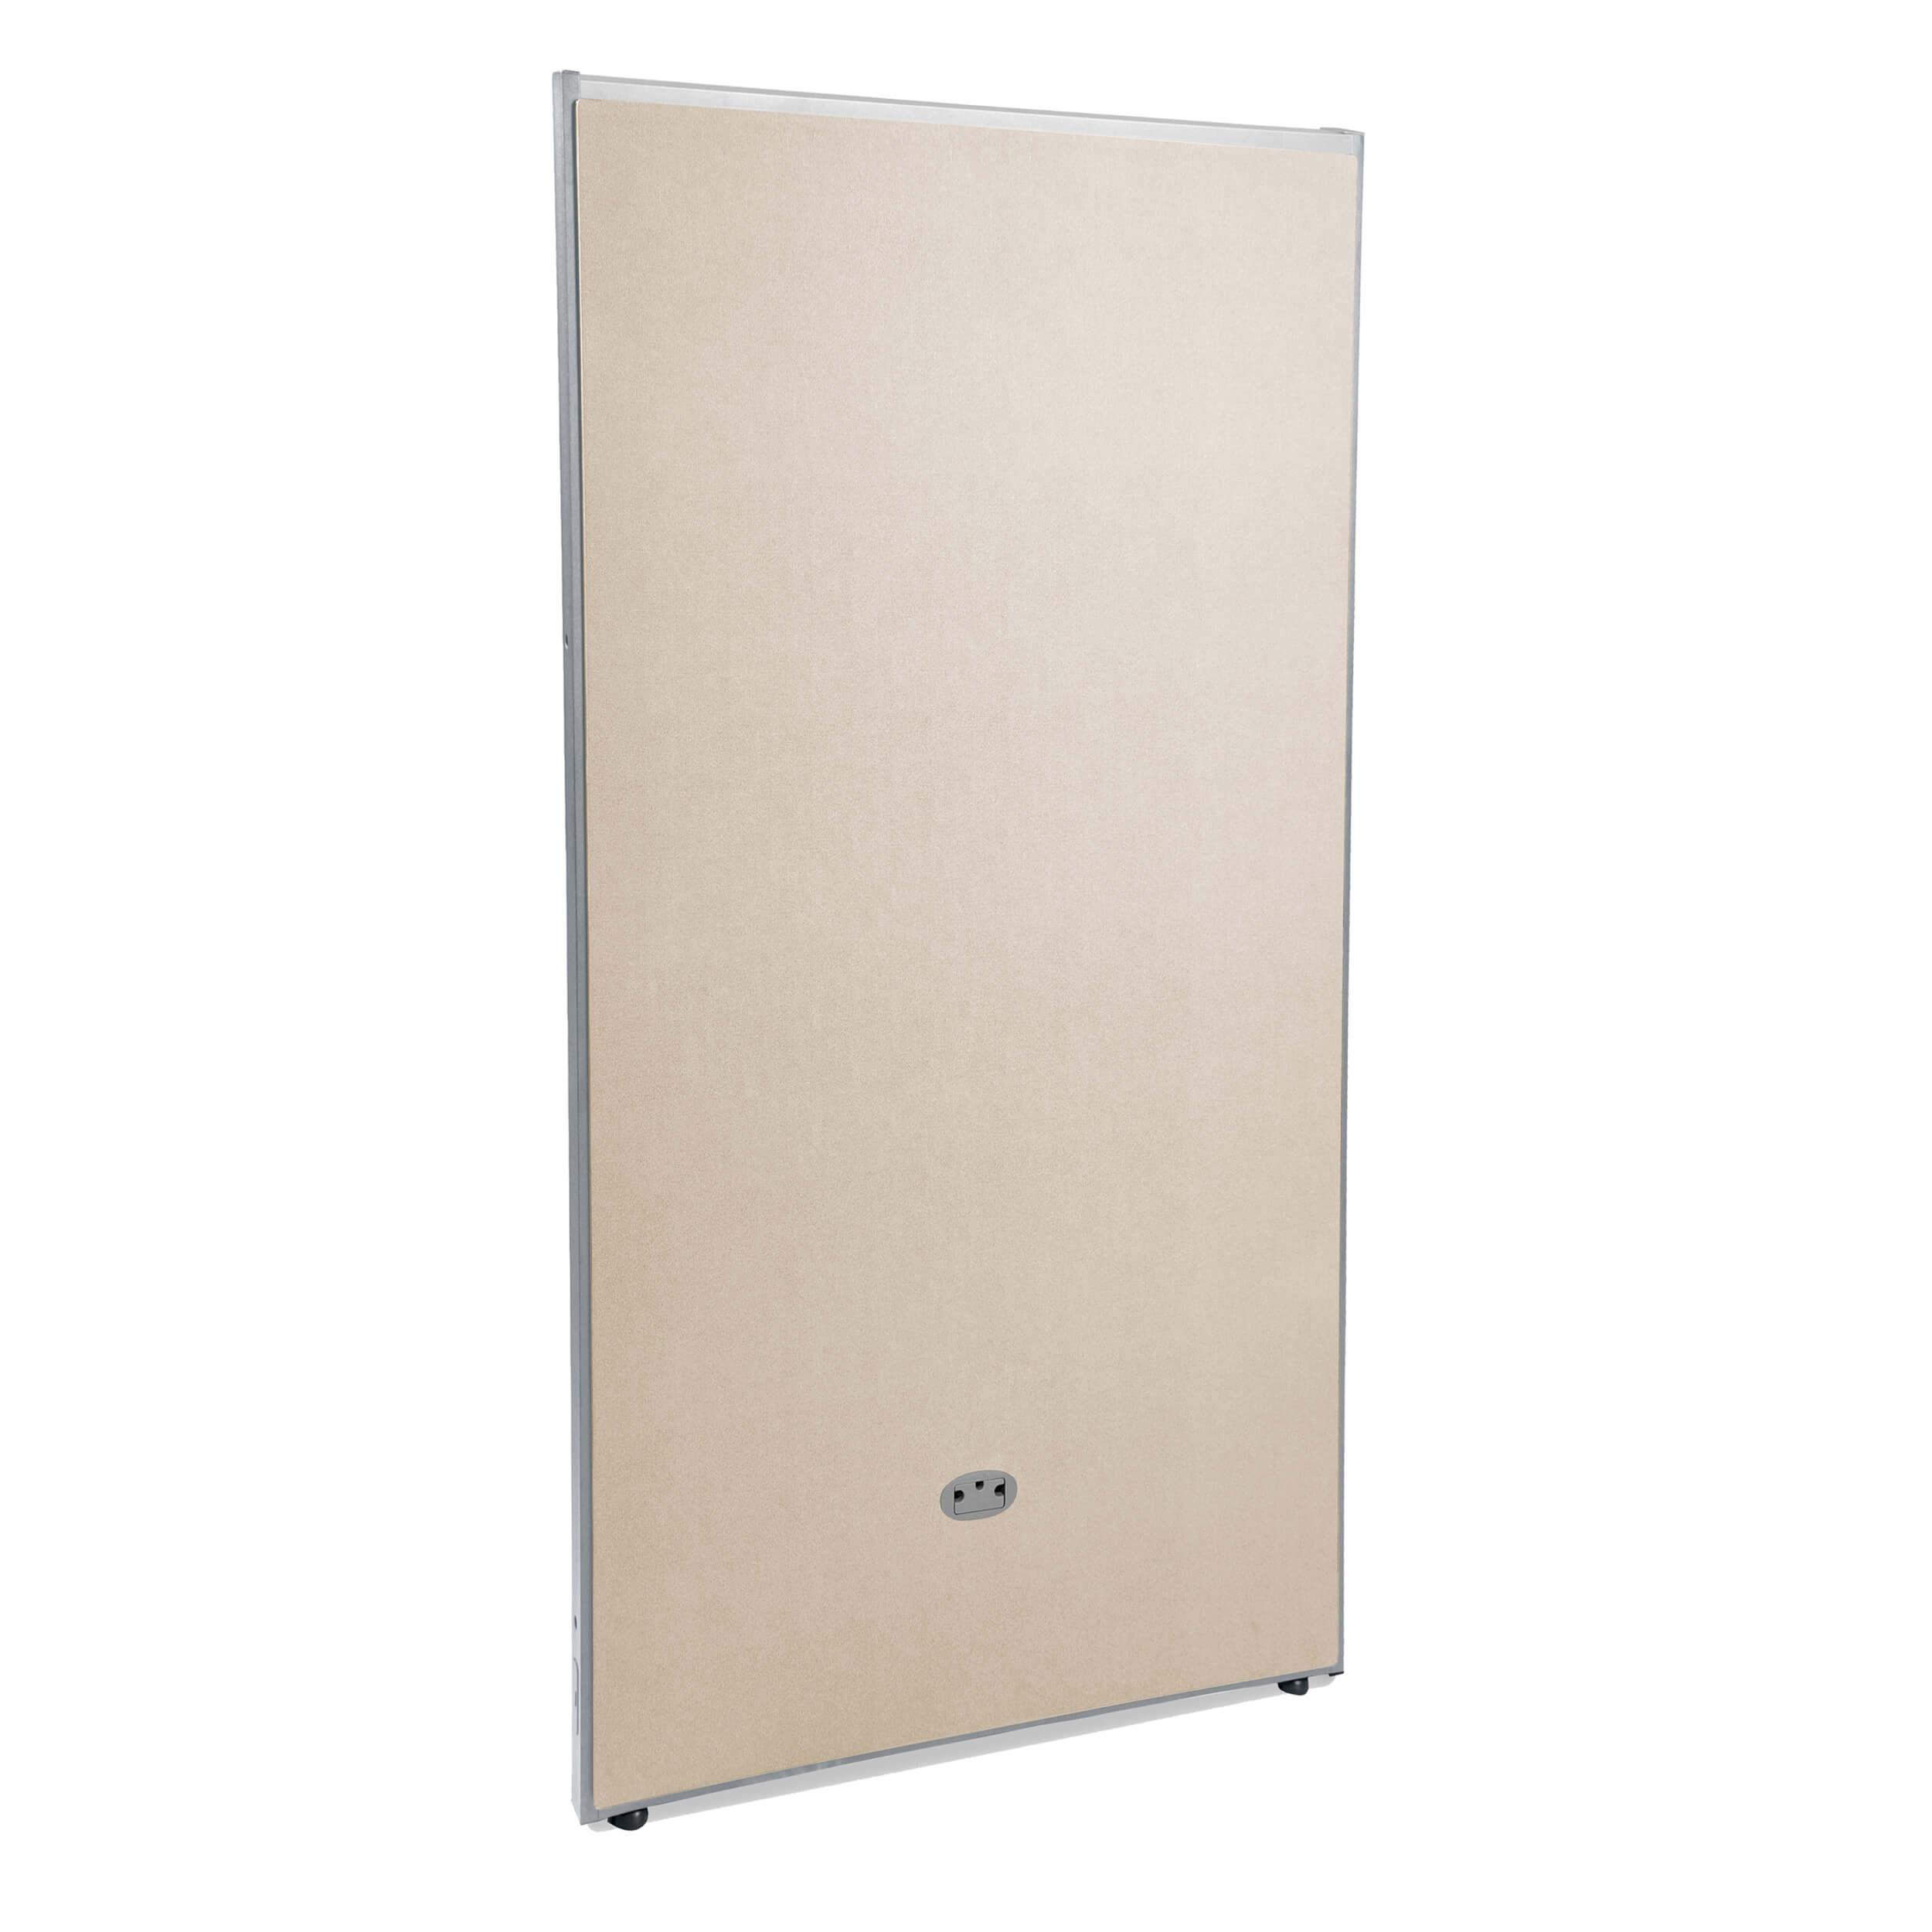 Modular Wall Panels 63x31